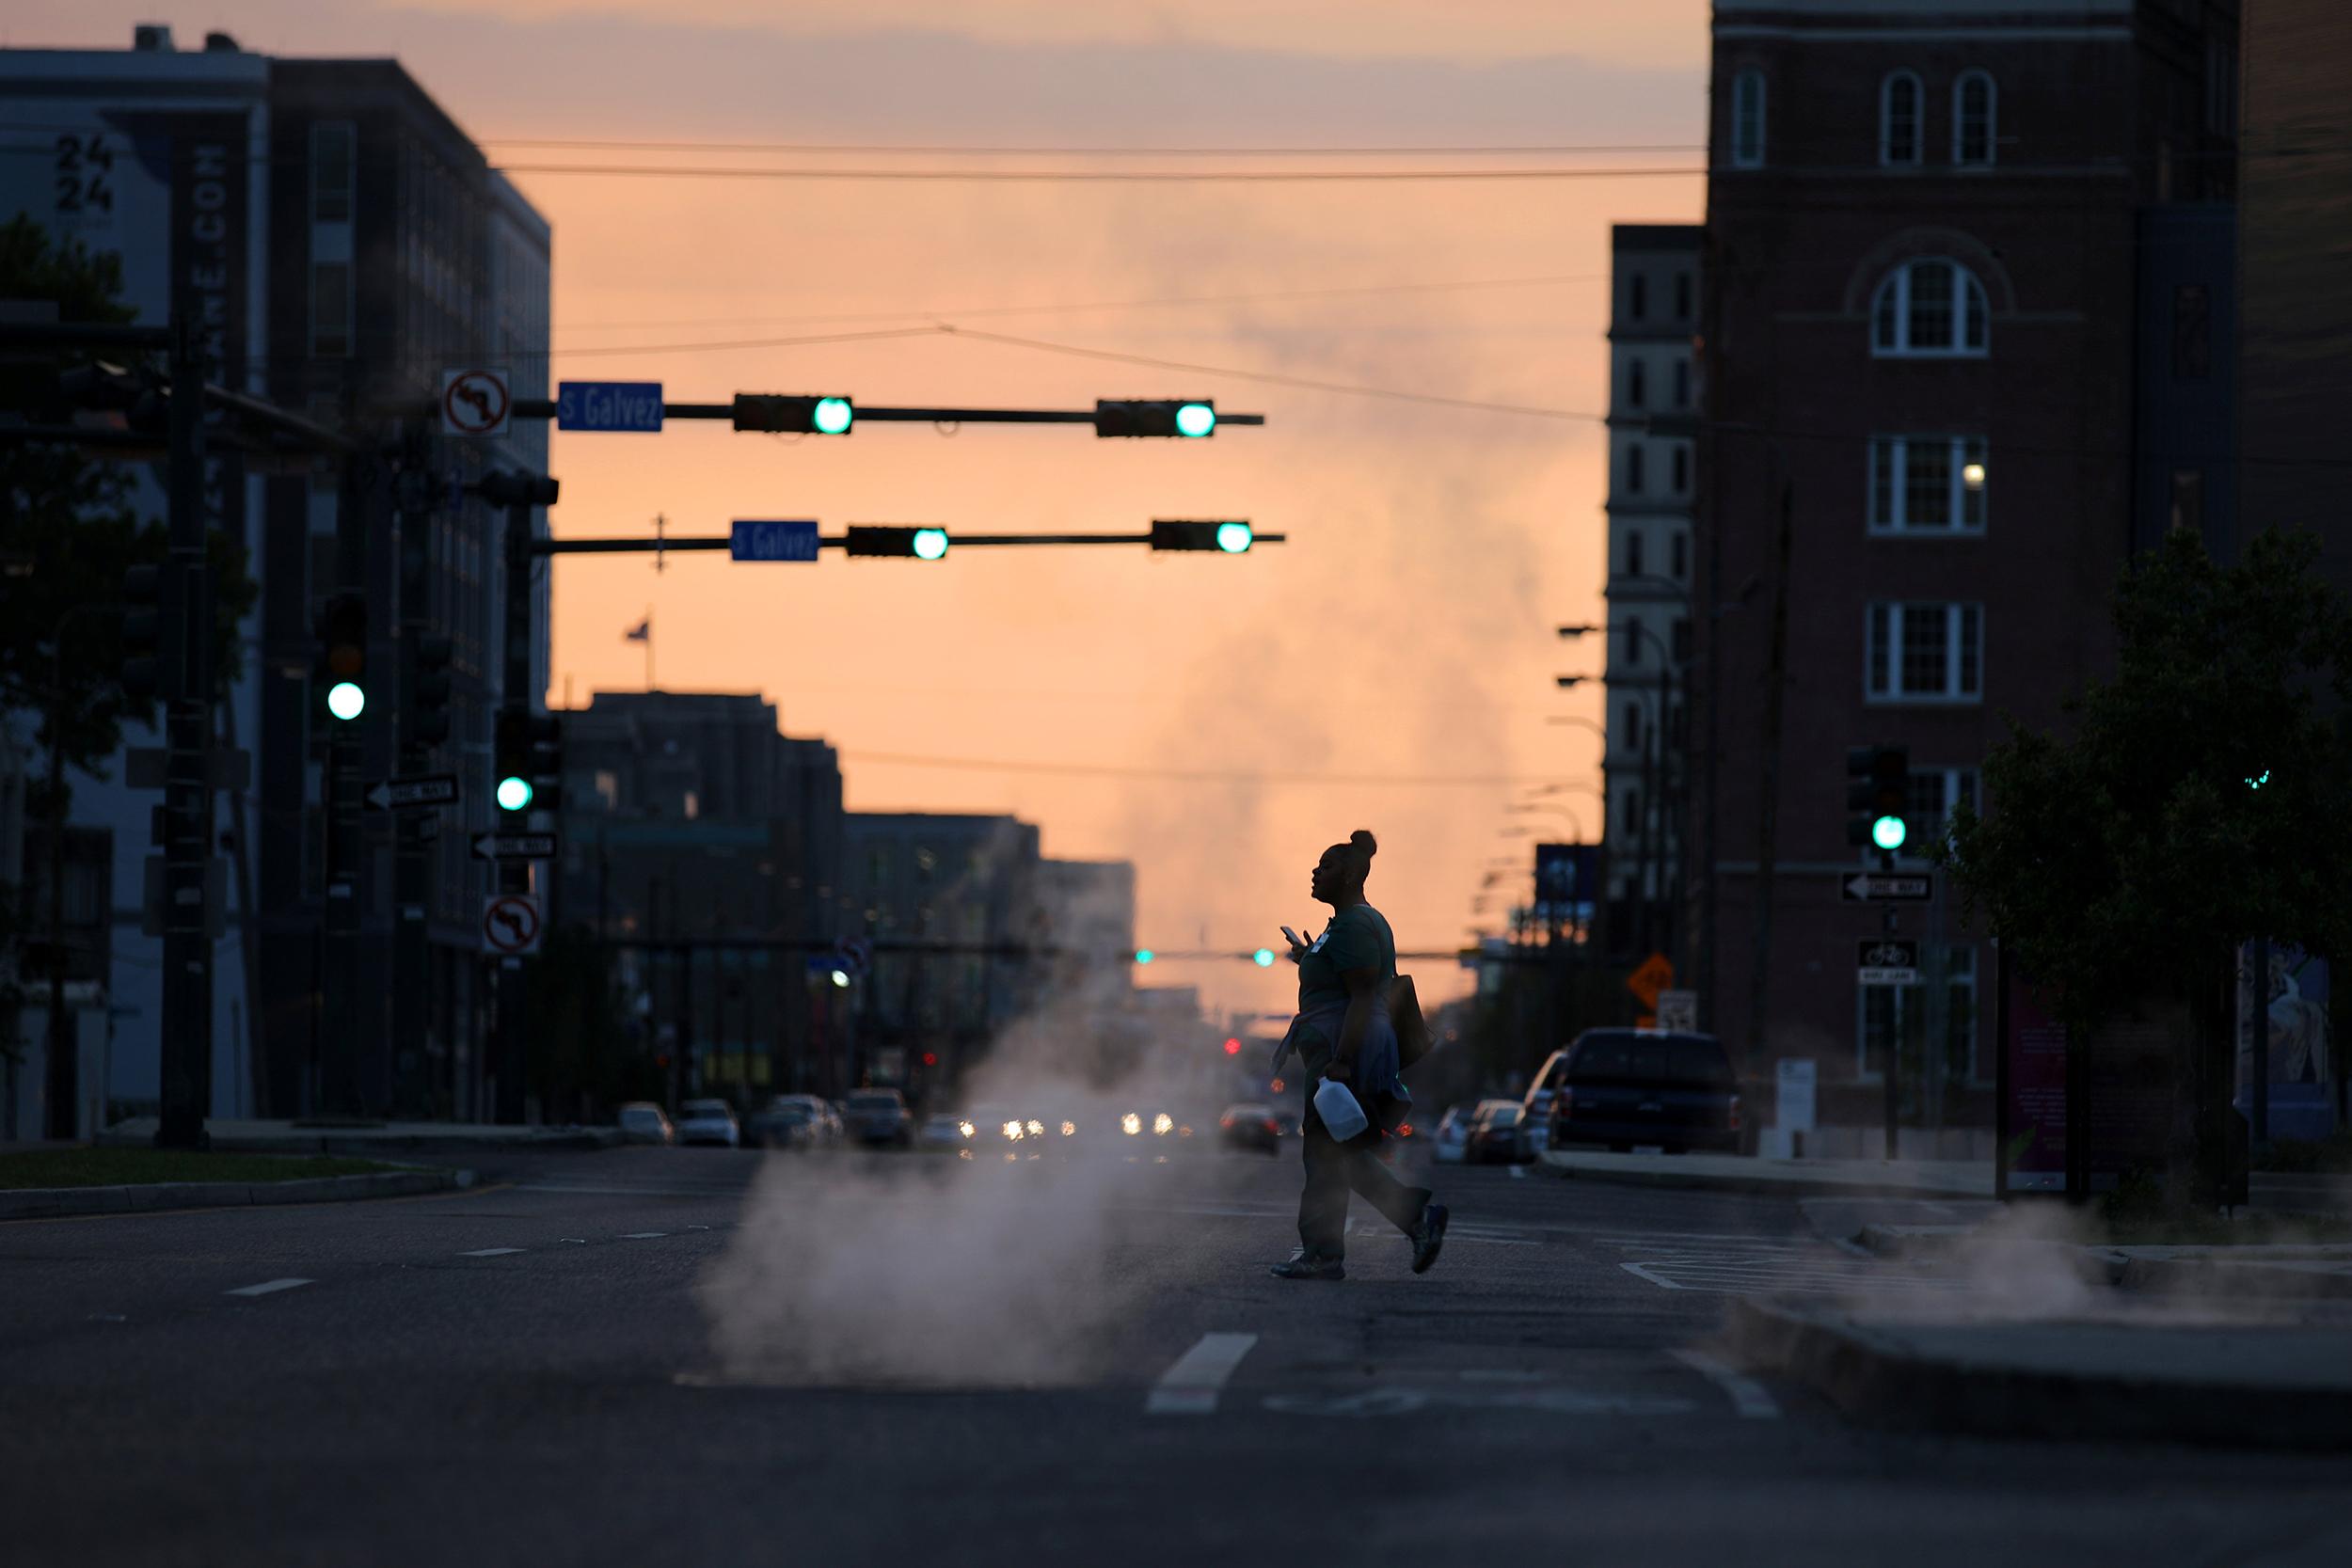 First pollution, now coronavirus: Black parish in Louisiana deals ...